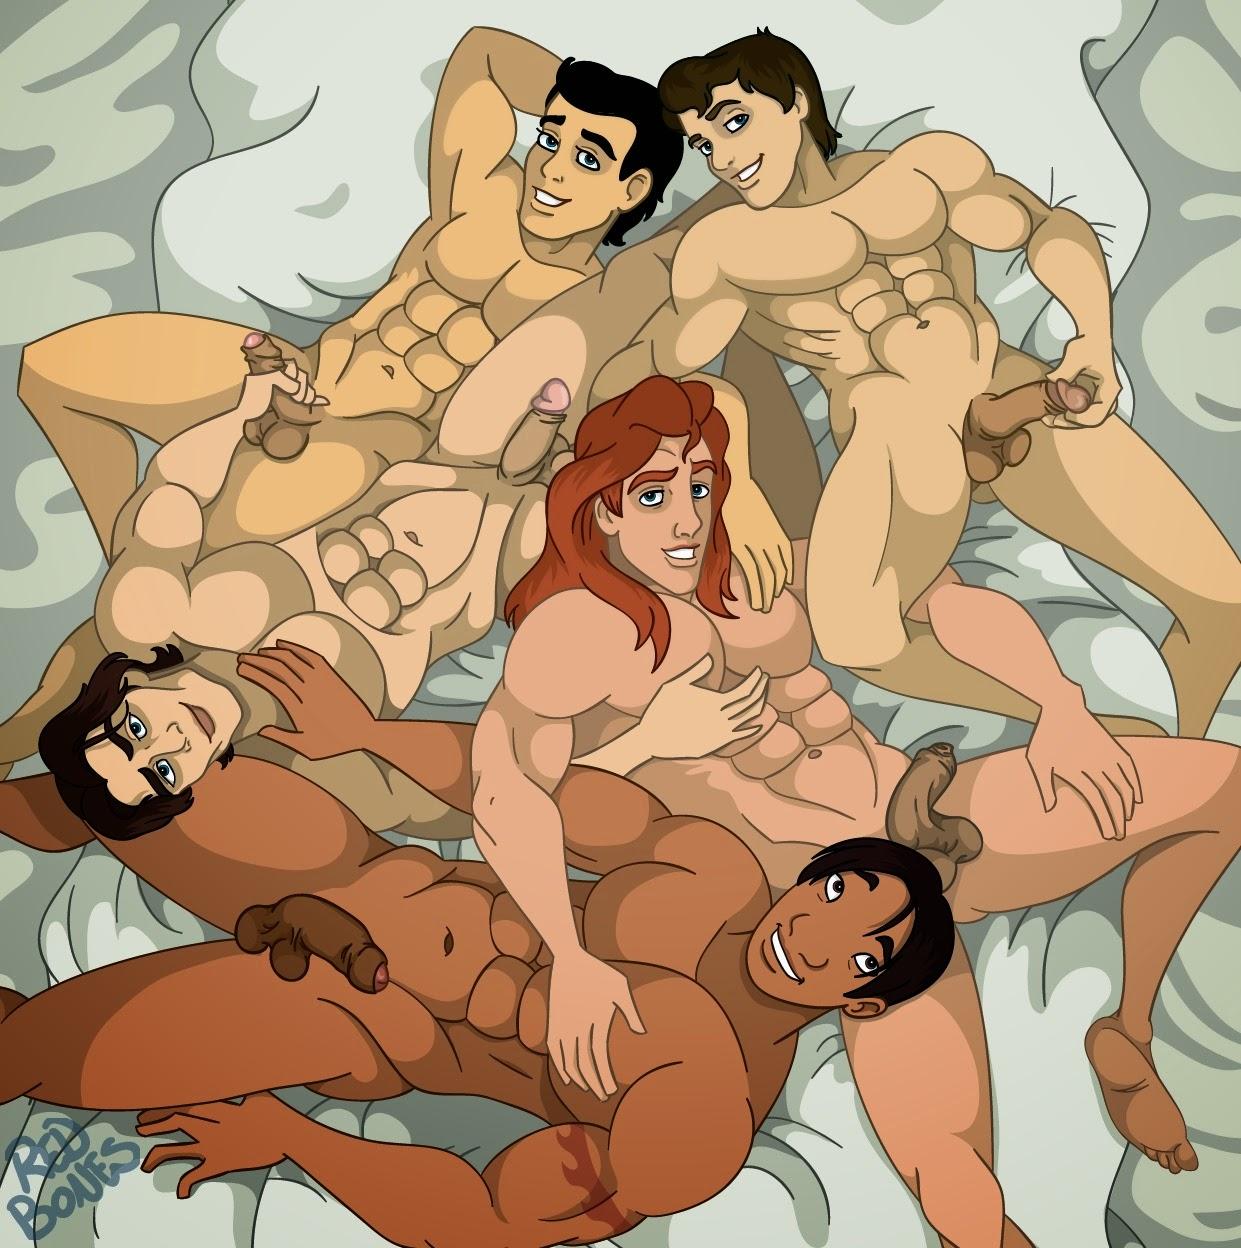 Free Gay Disney Prince Cartoon Porn